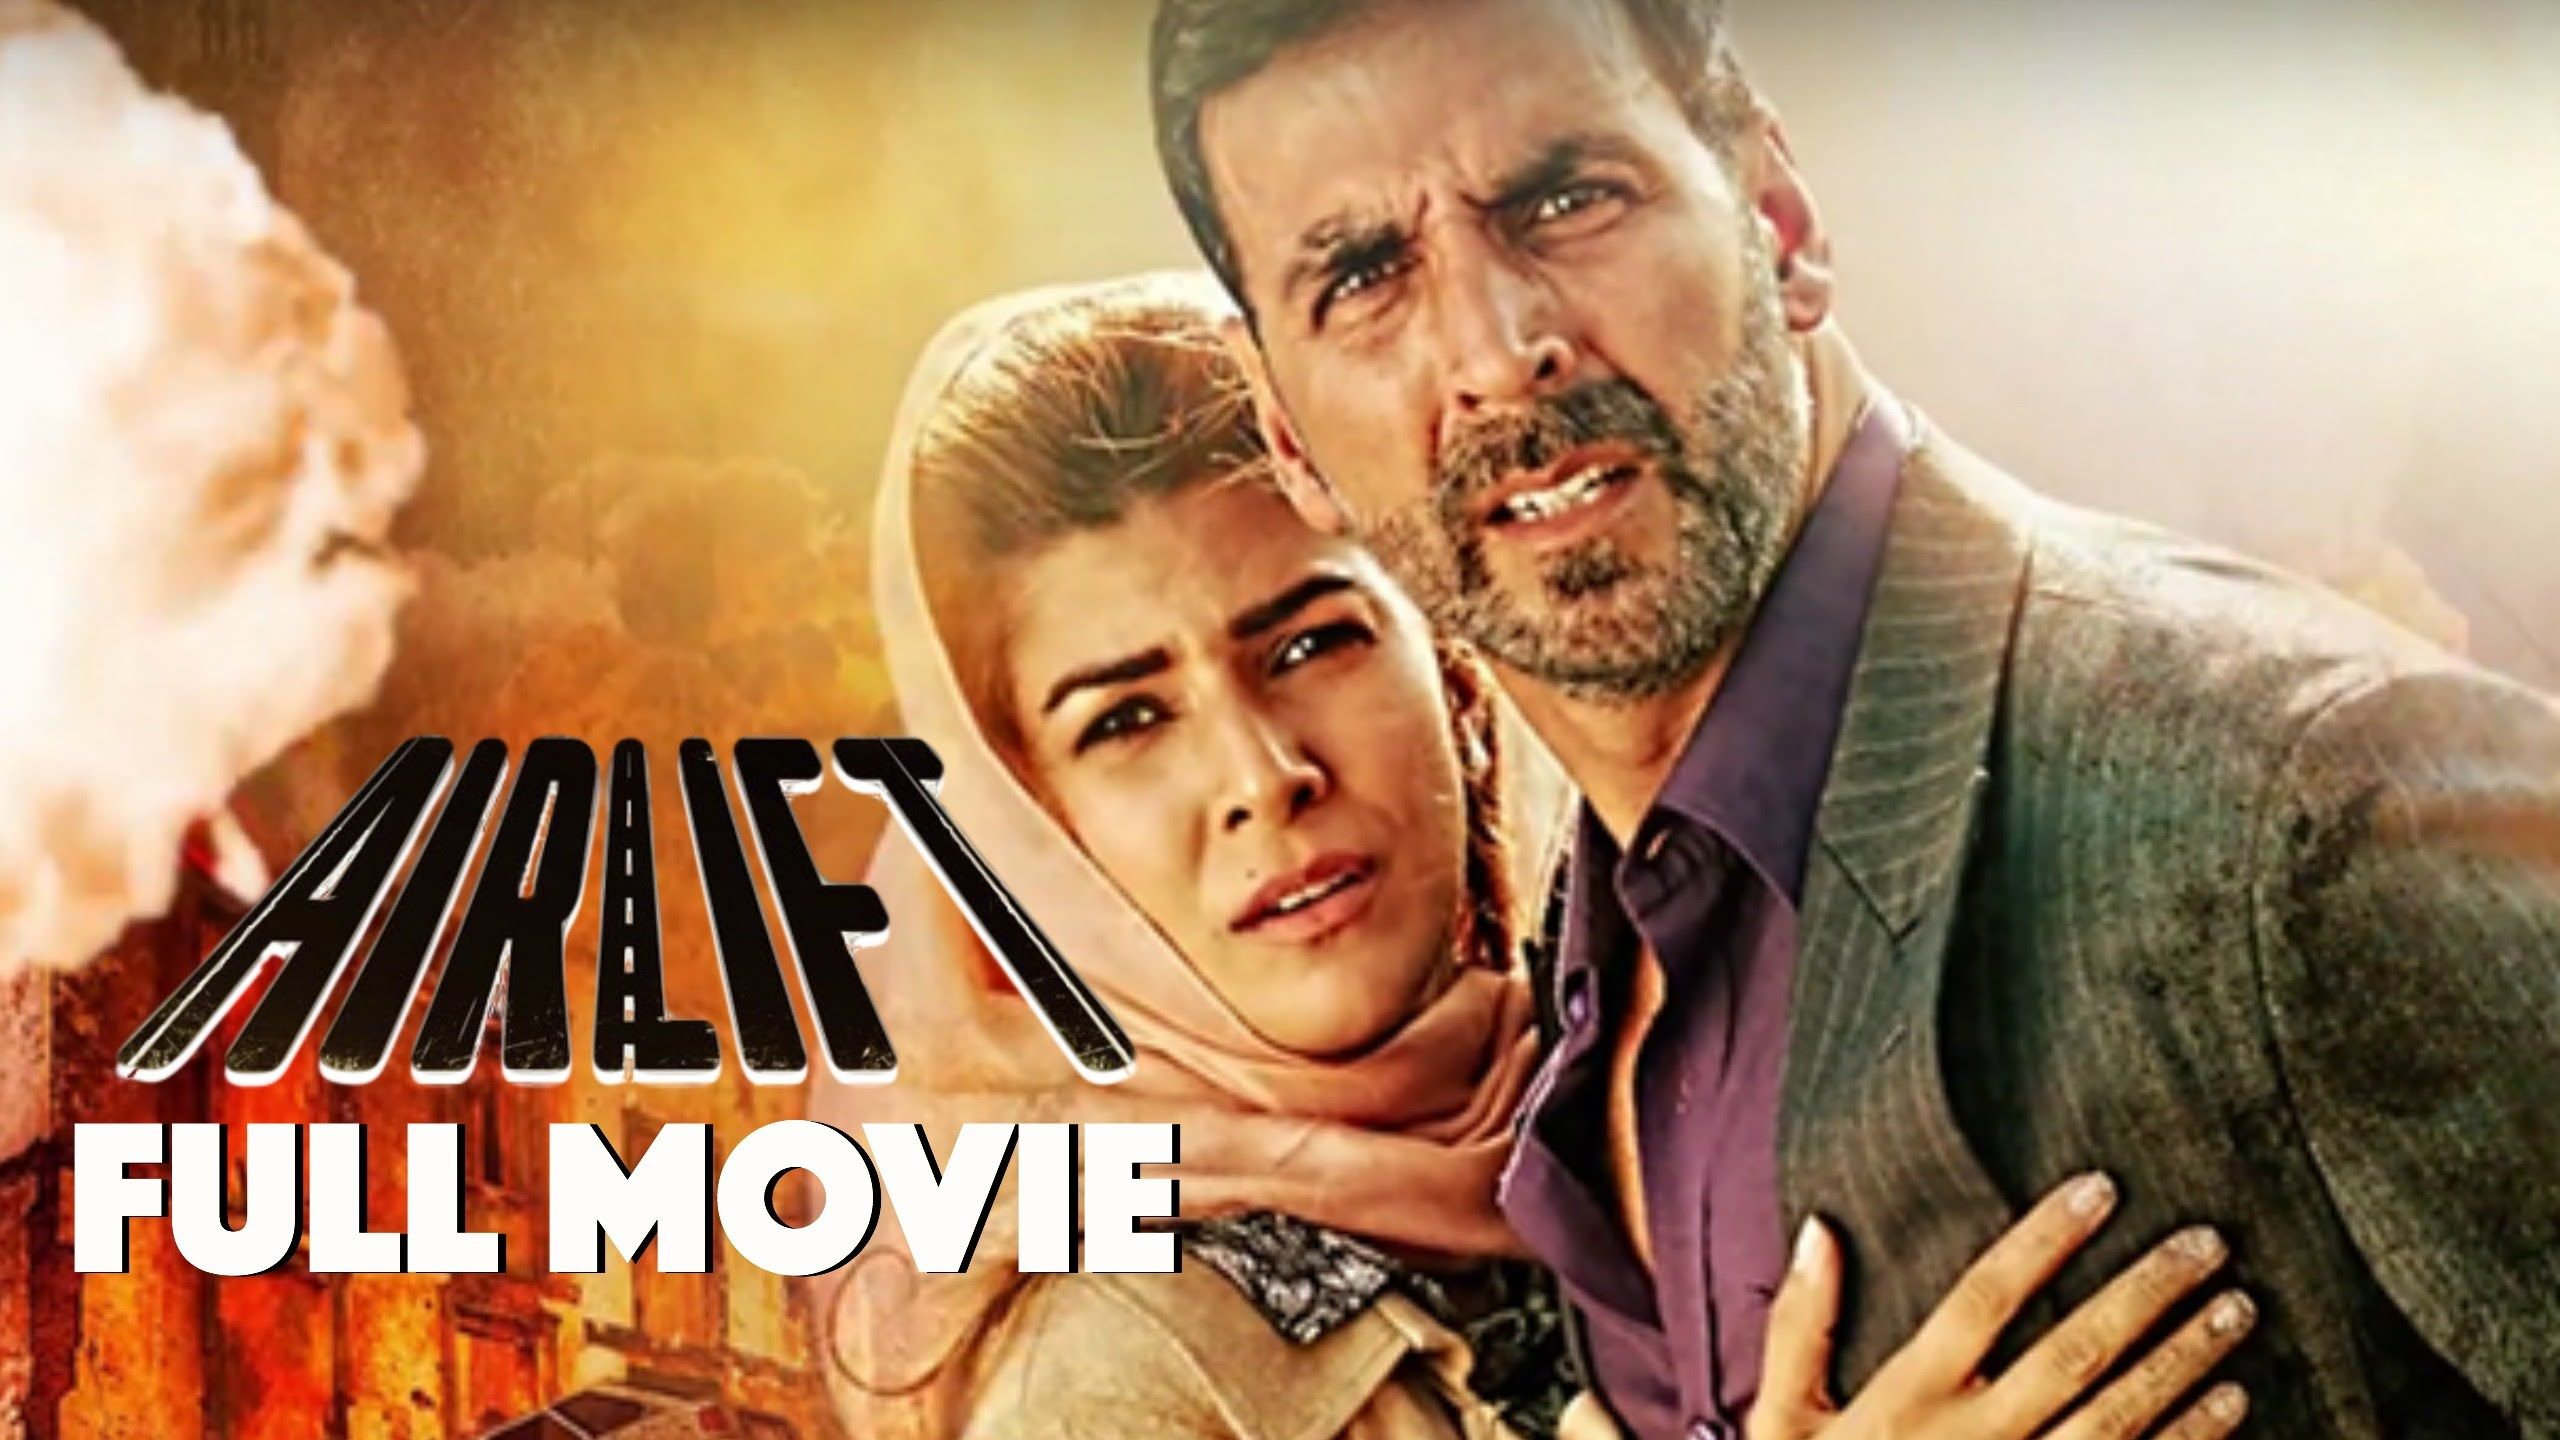 Netflix Airlift Bollywood Akshay Kumar Nimrat Kaur Full Movies Online Free Hd Movies Download Full Movies